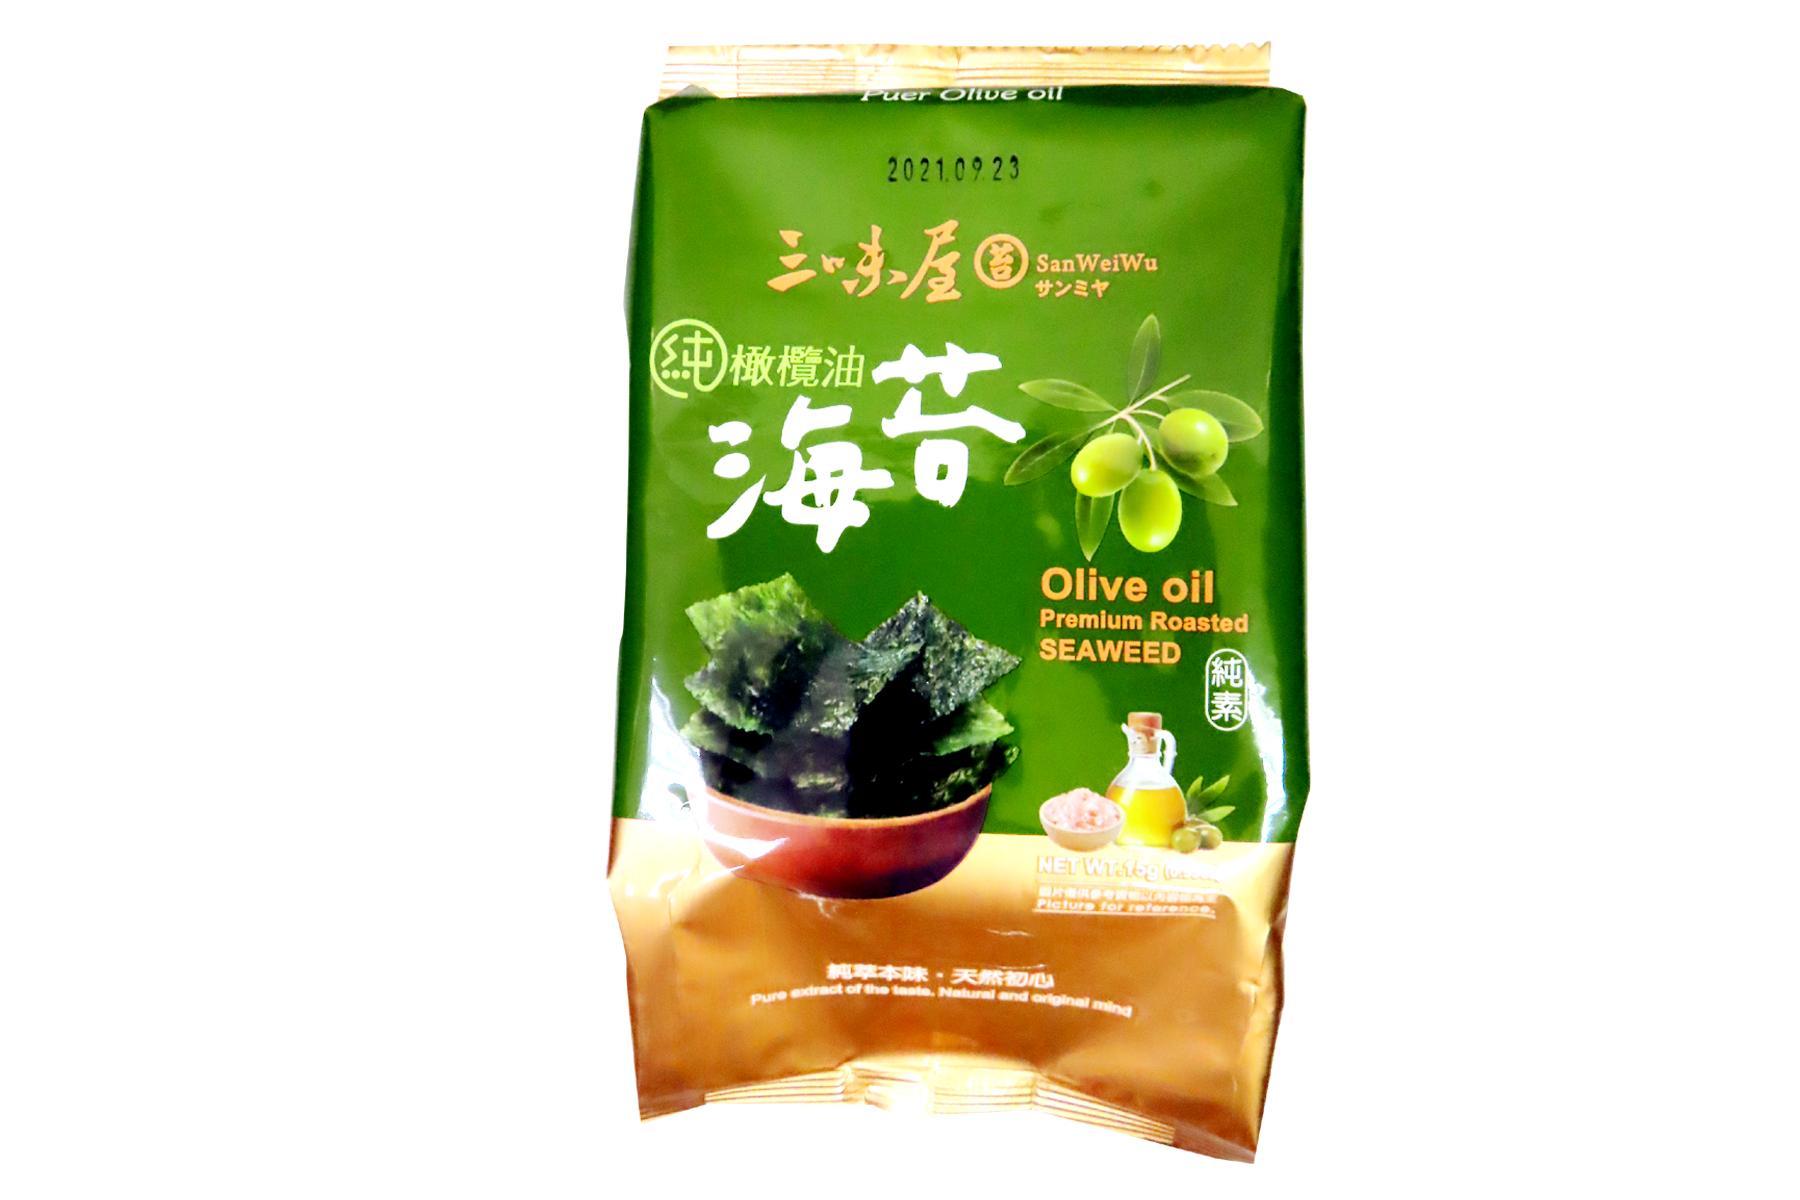 Image Olive Oil Premium Roasted Crispy Seaweed 三味屋-橄榄油海苔 15grams